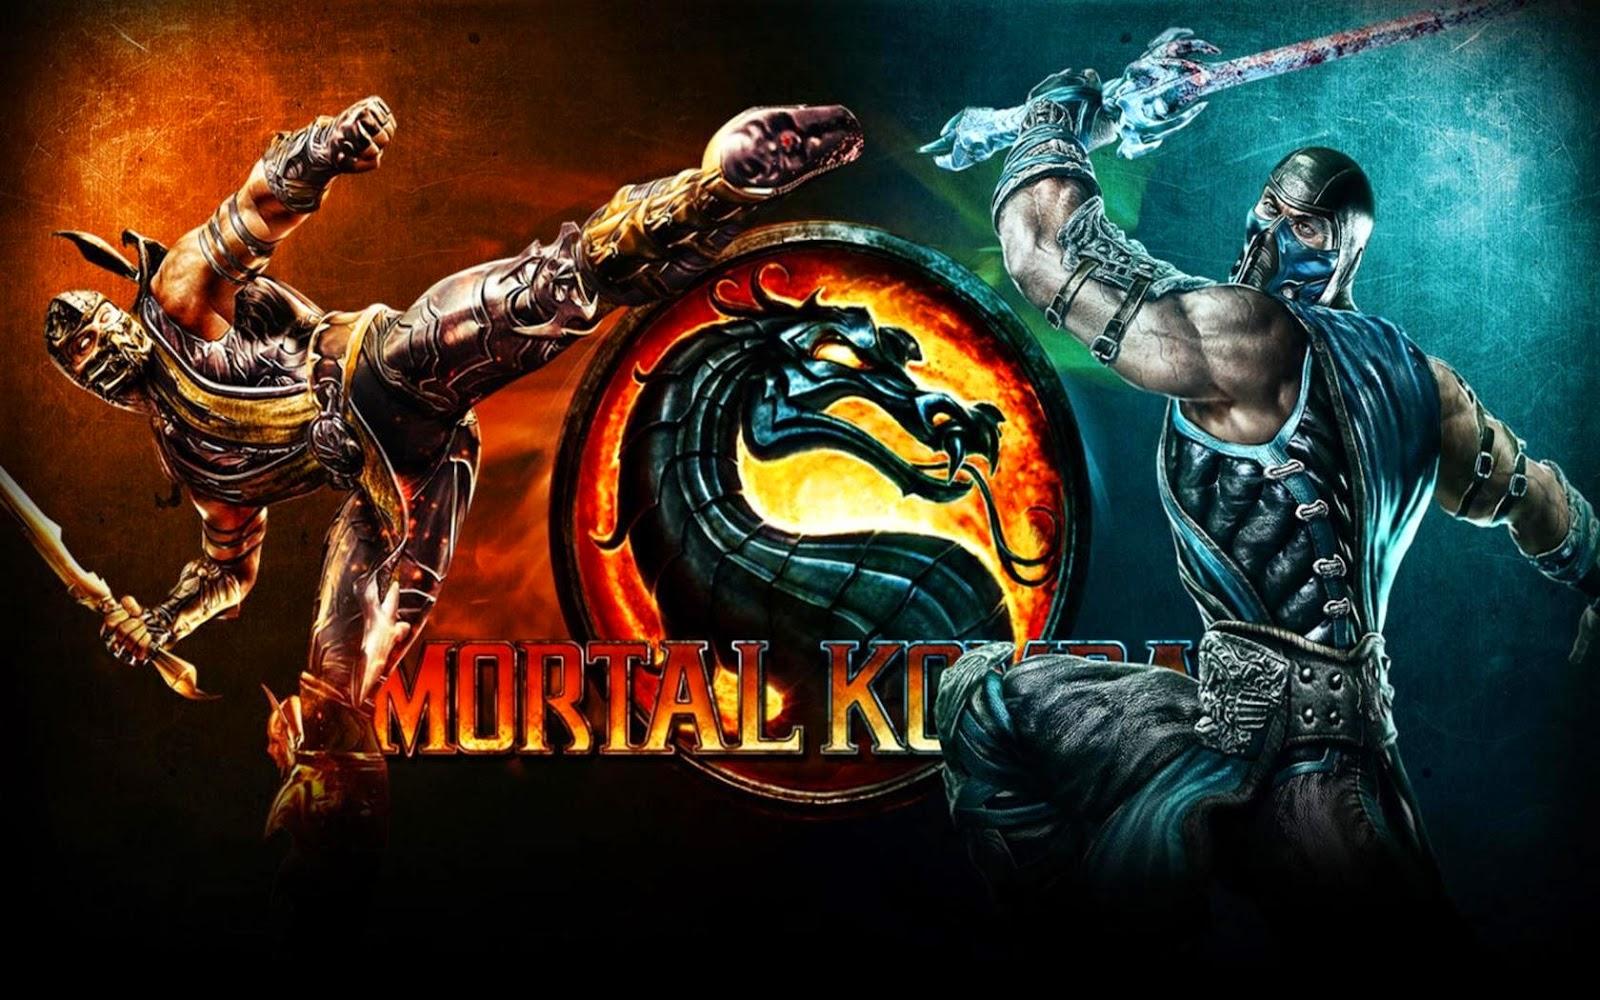 Mortal kombat x v1 11 0 mega mod apk data all gpu filefrogg